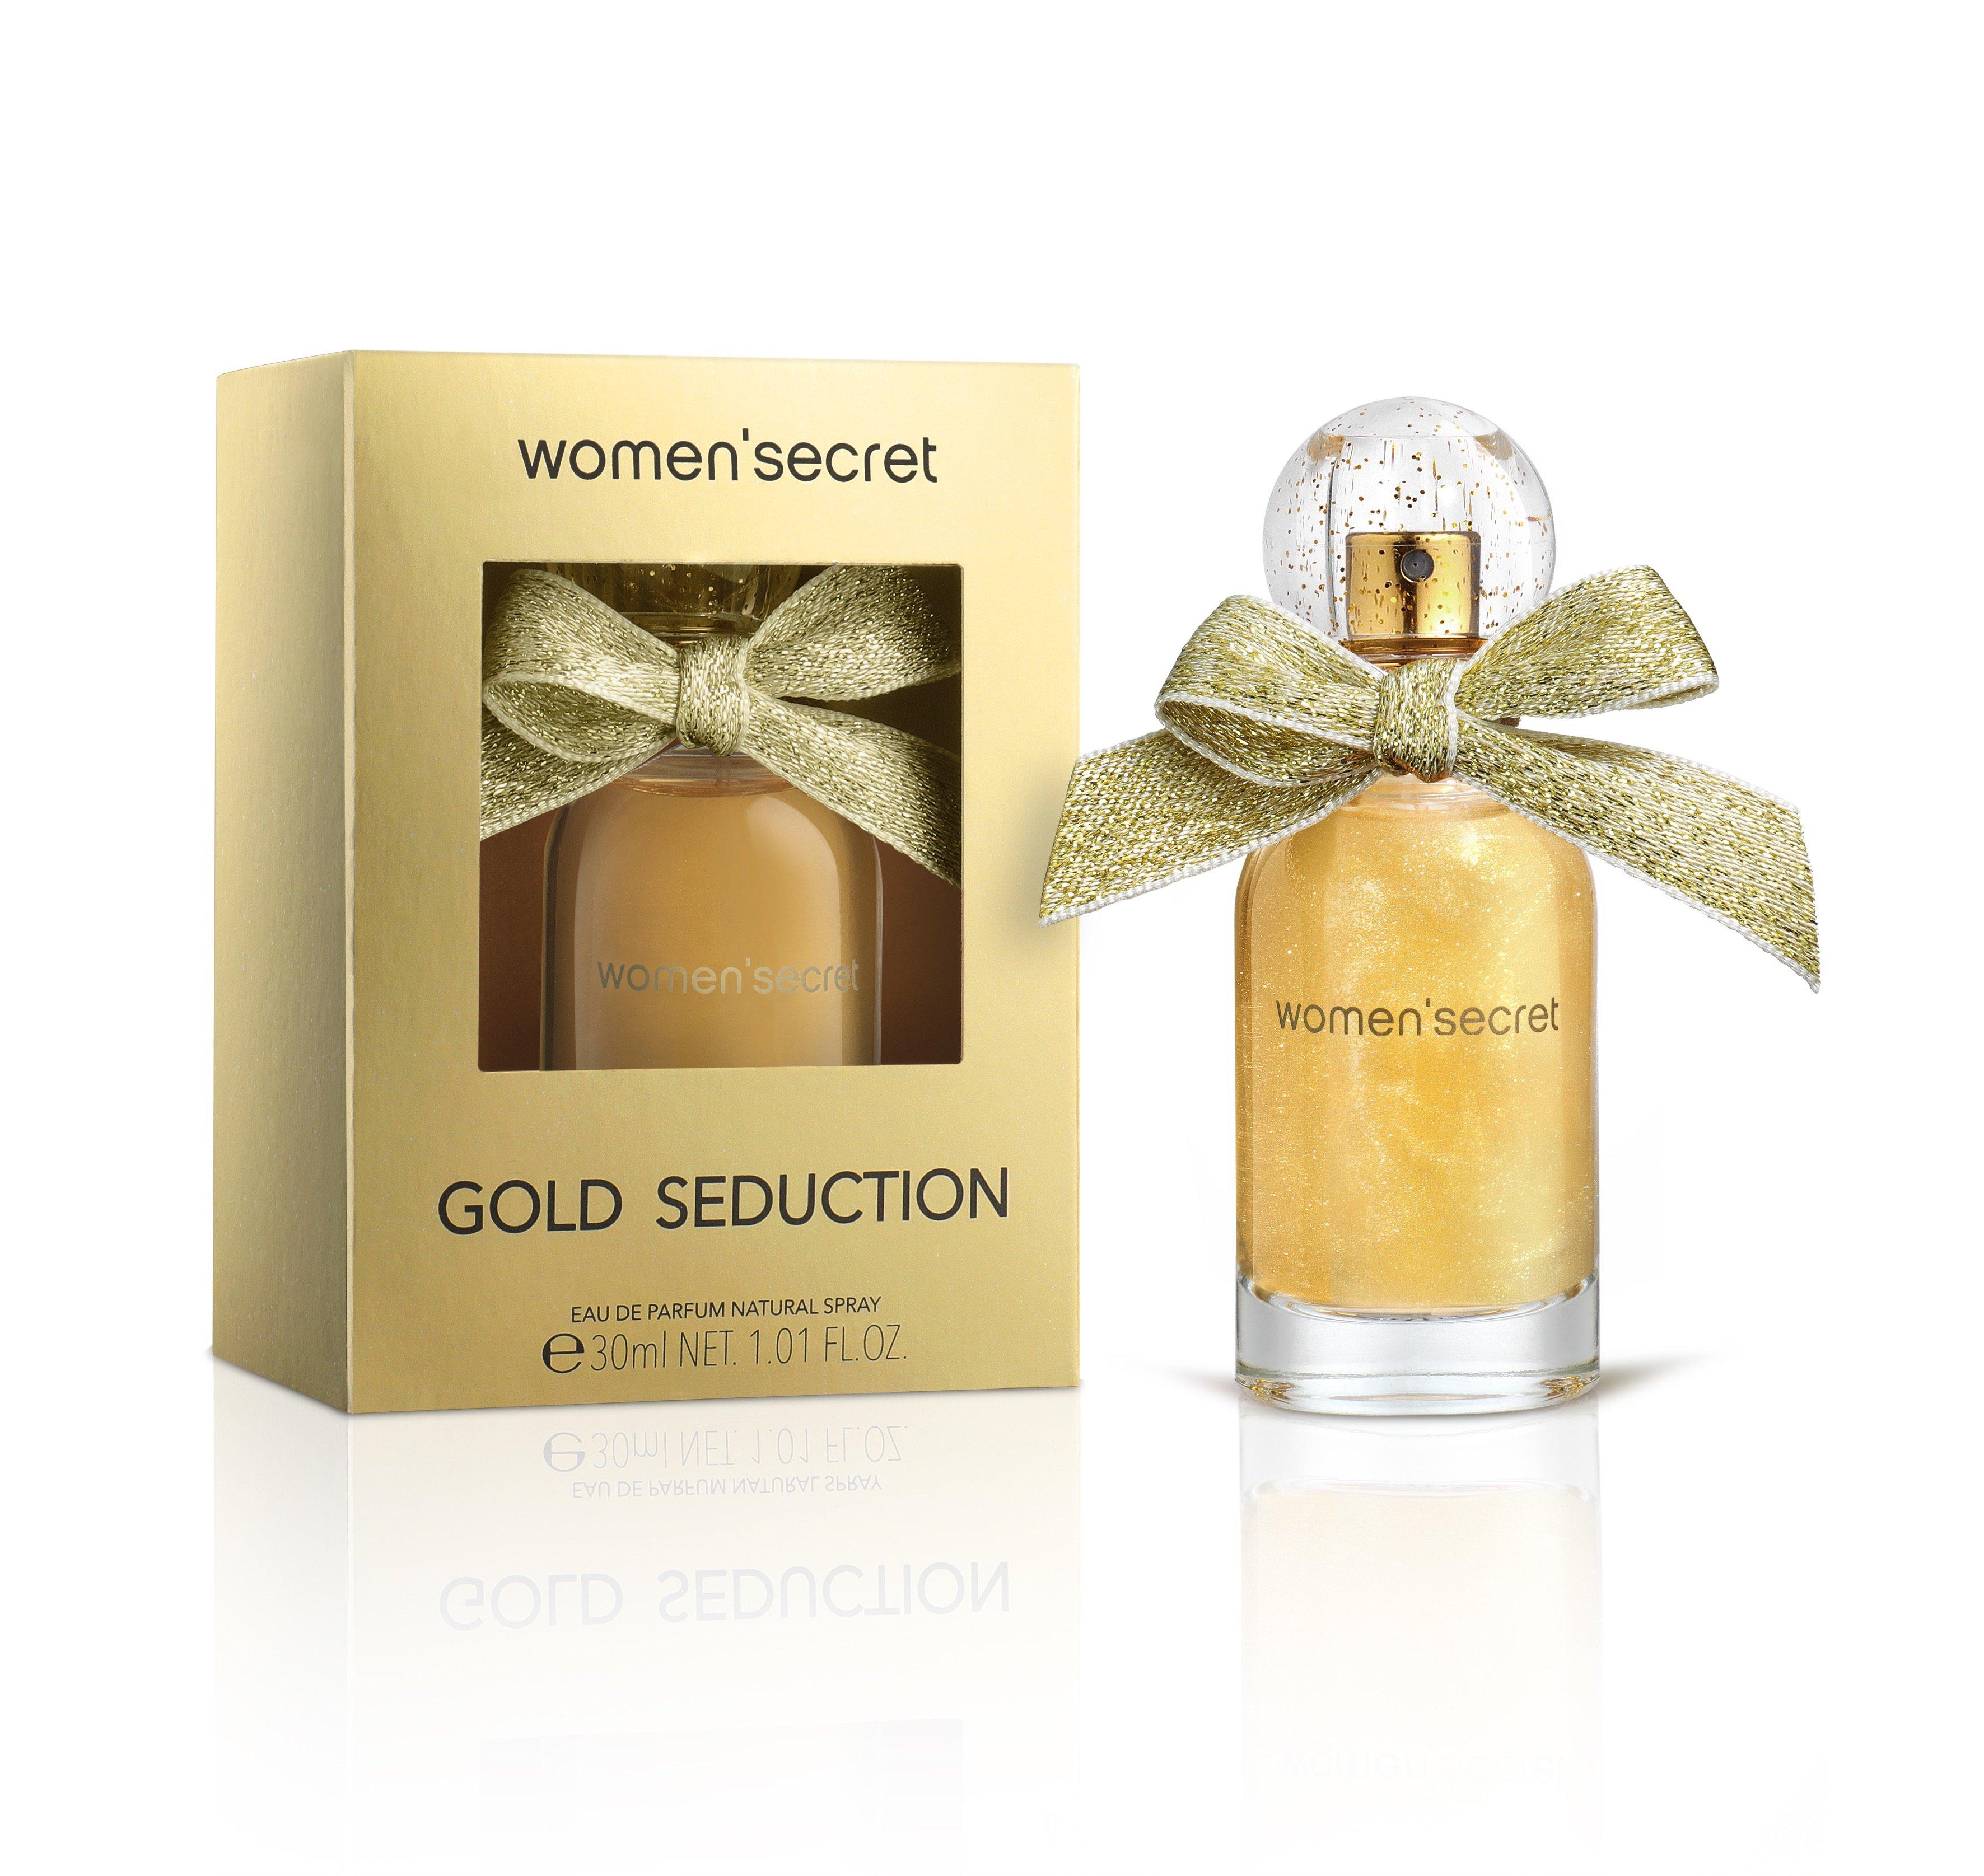 Gold Seduction i Glossybox